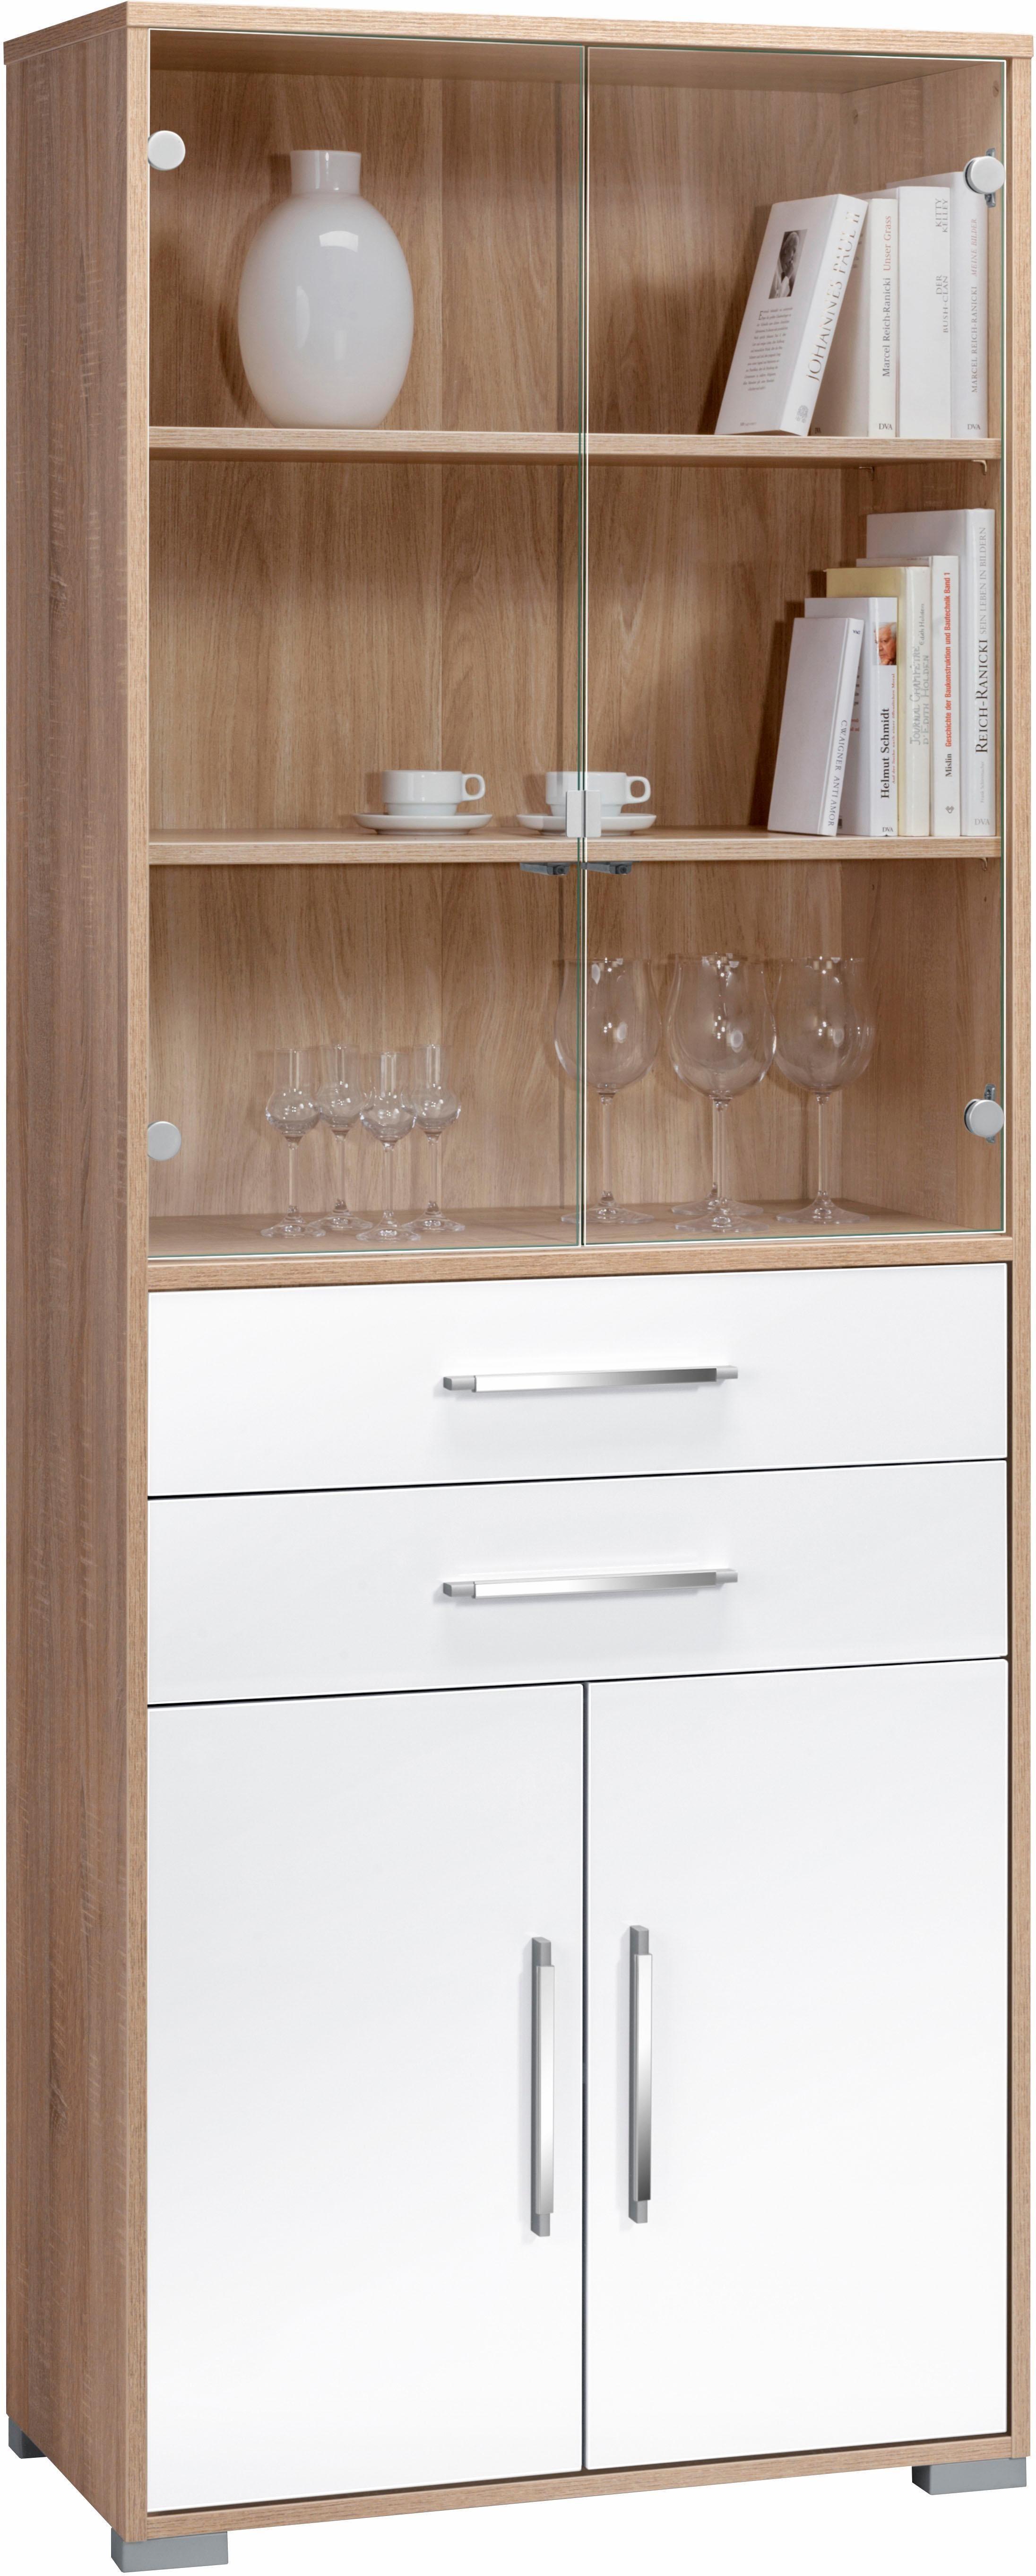 Maja Möbel Aktenschrank »System« | Büro > Büroschränke > Aktenschränke | Weiß - Grau - Glanz | Sonoma - Abs - Melamin | Maja Möbel